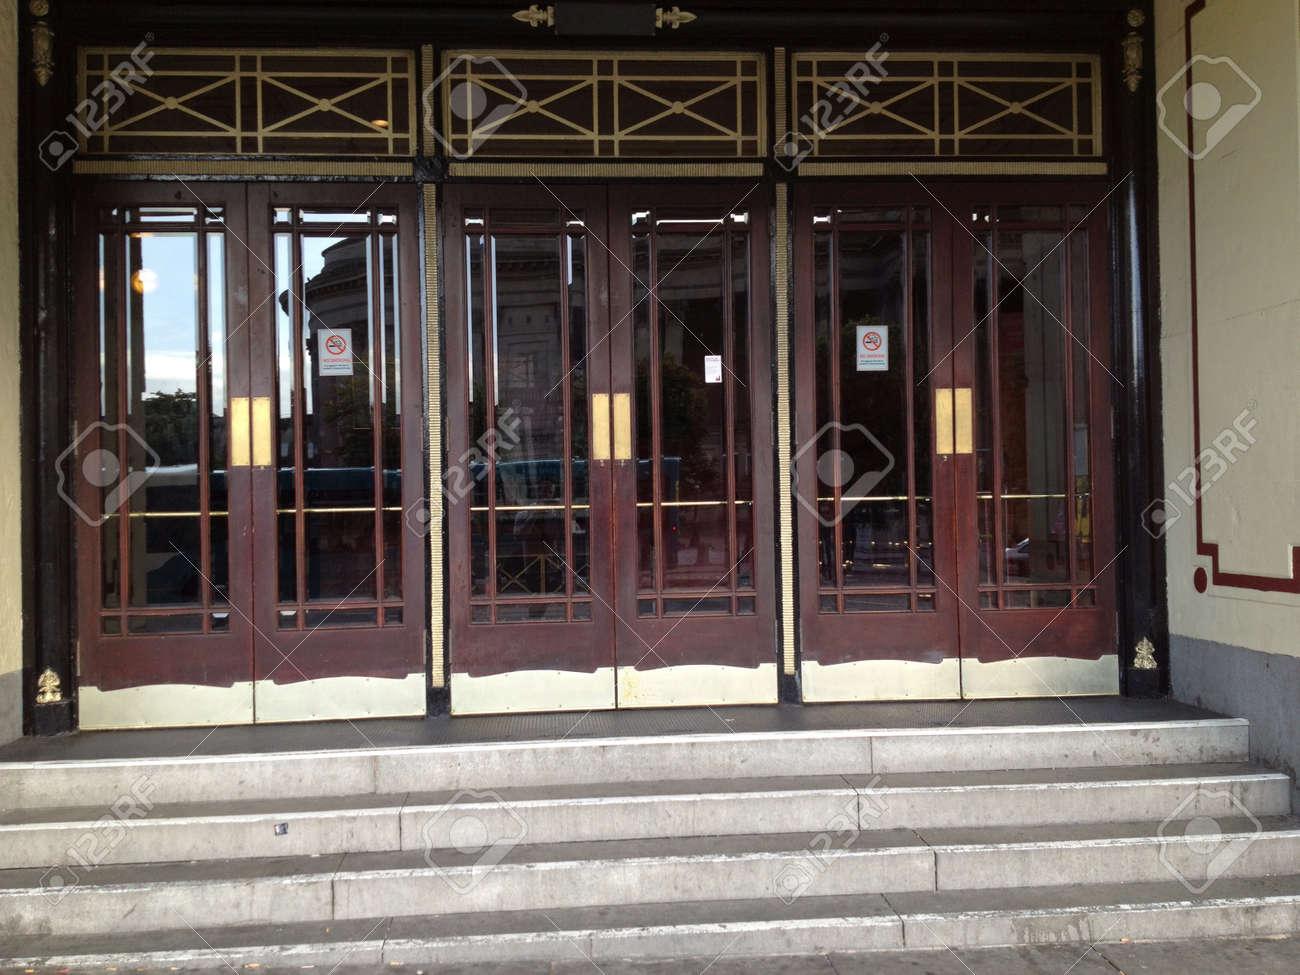 Empire theatre doors Stock Photo - 21517557 & Empire Theatre Doors Stock Photo Picture And Royalty Free Image ...